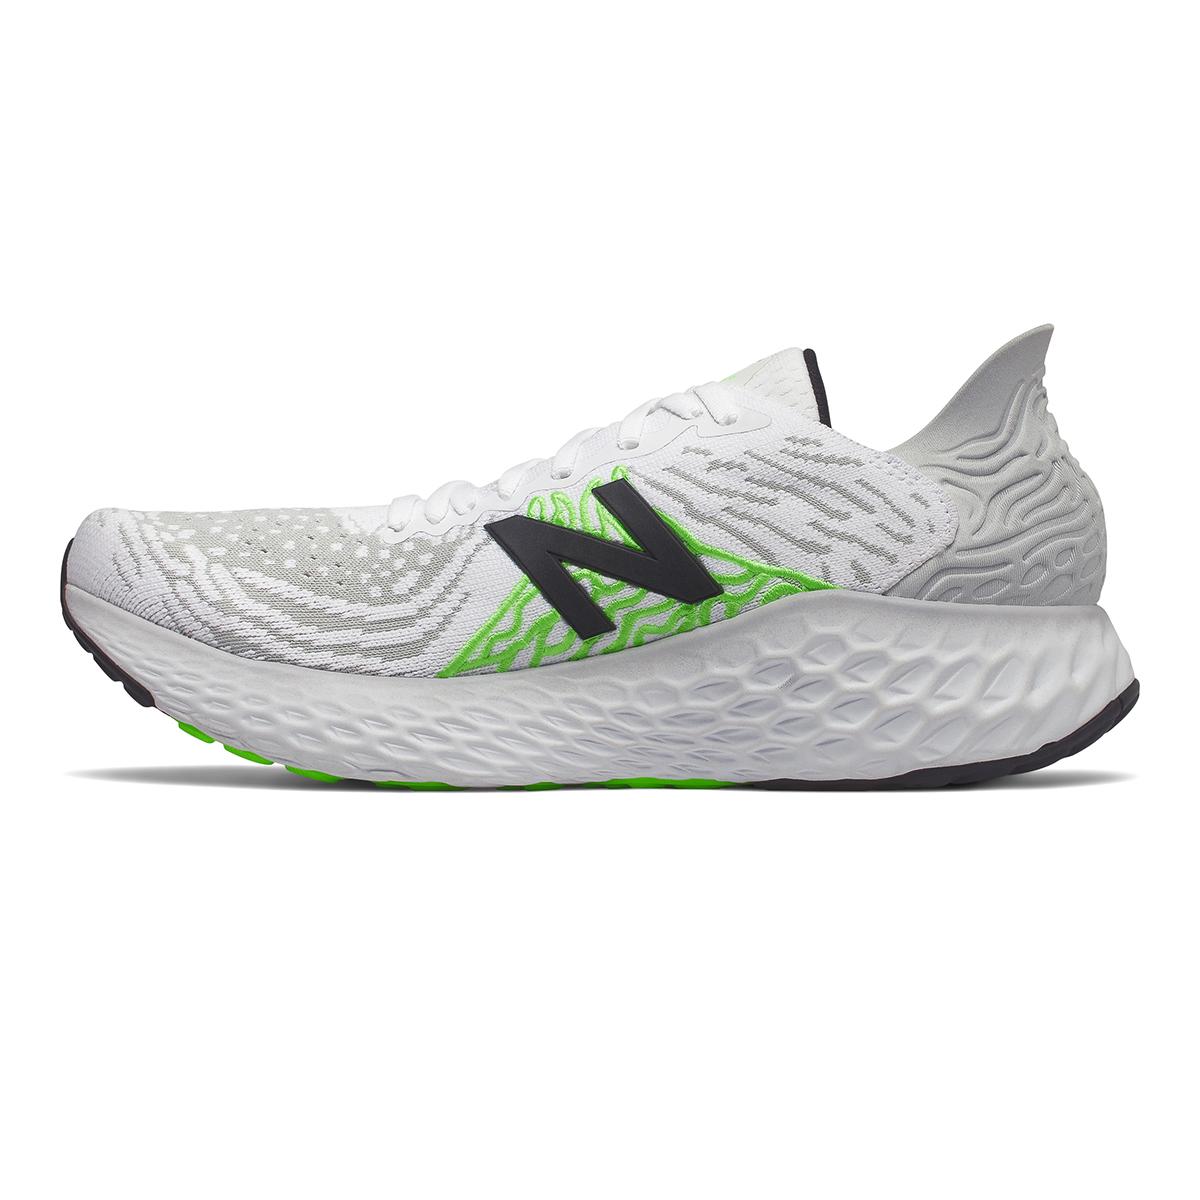 Men's New Balance Fresh Foam 1080v10 Running Shoe - Color: Light Aluminum - Size: 7 - Width: Wide, Light Aluminum, large, image 2